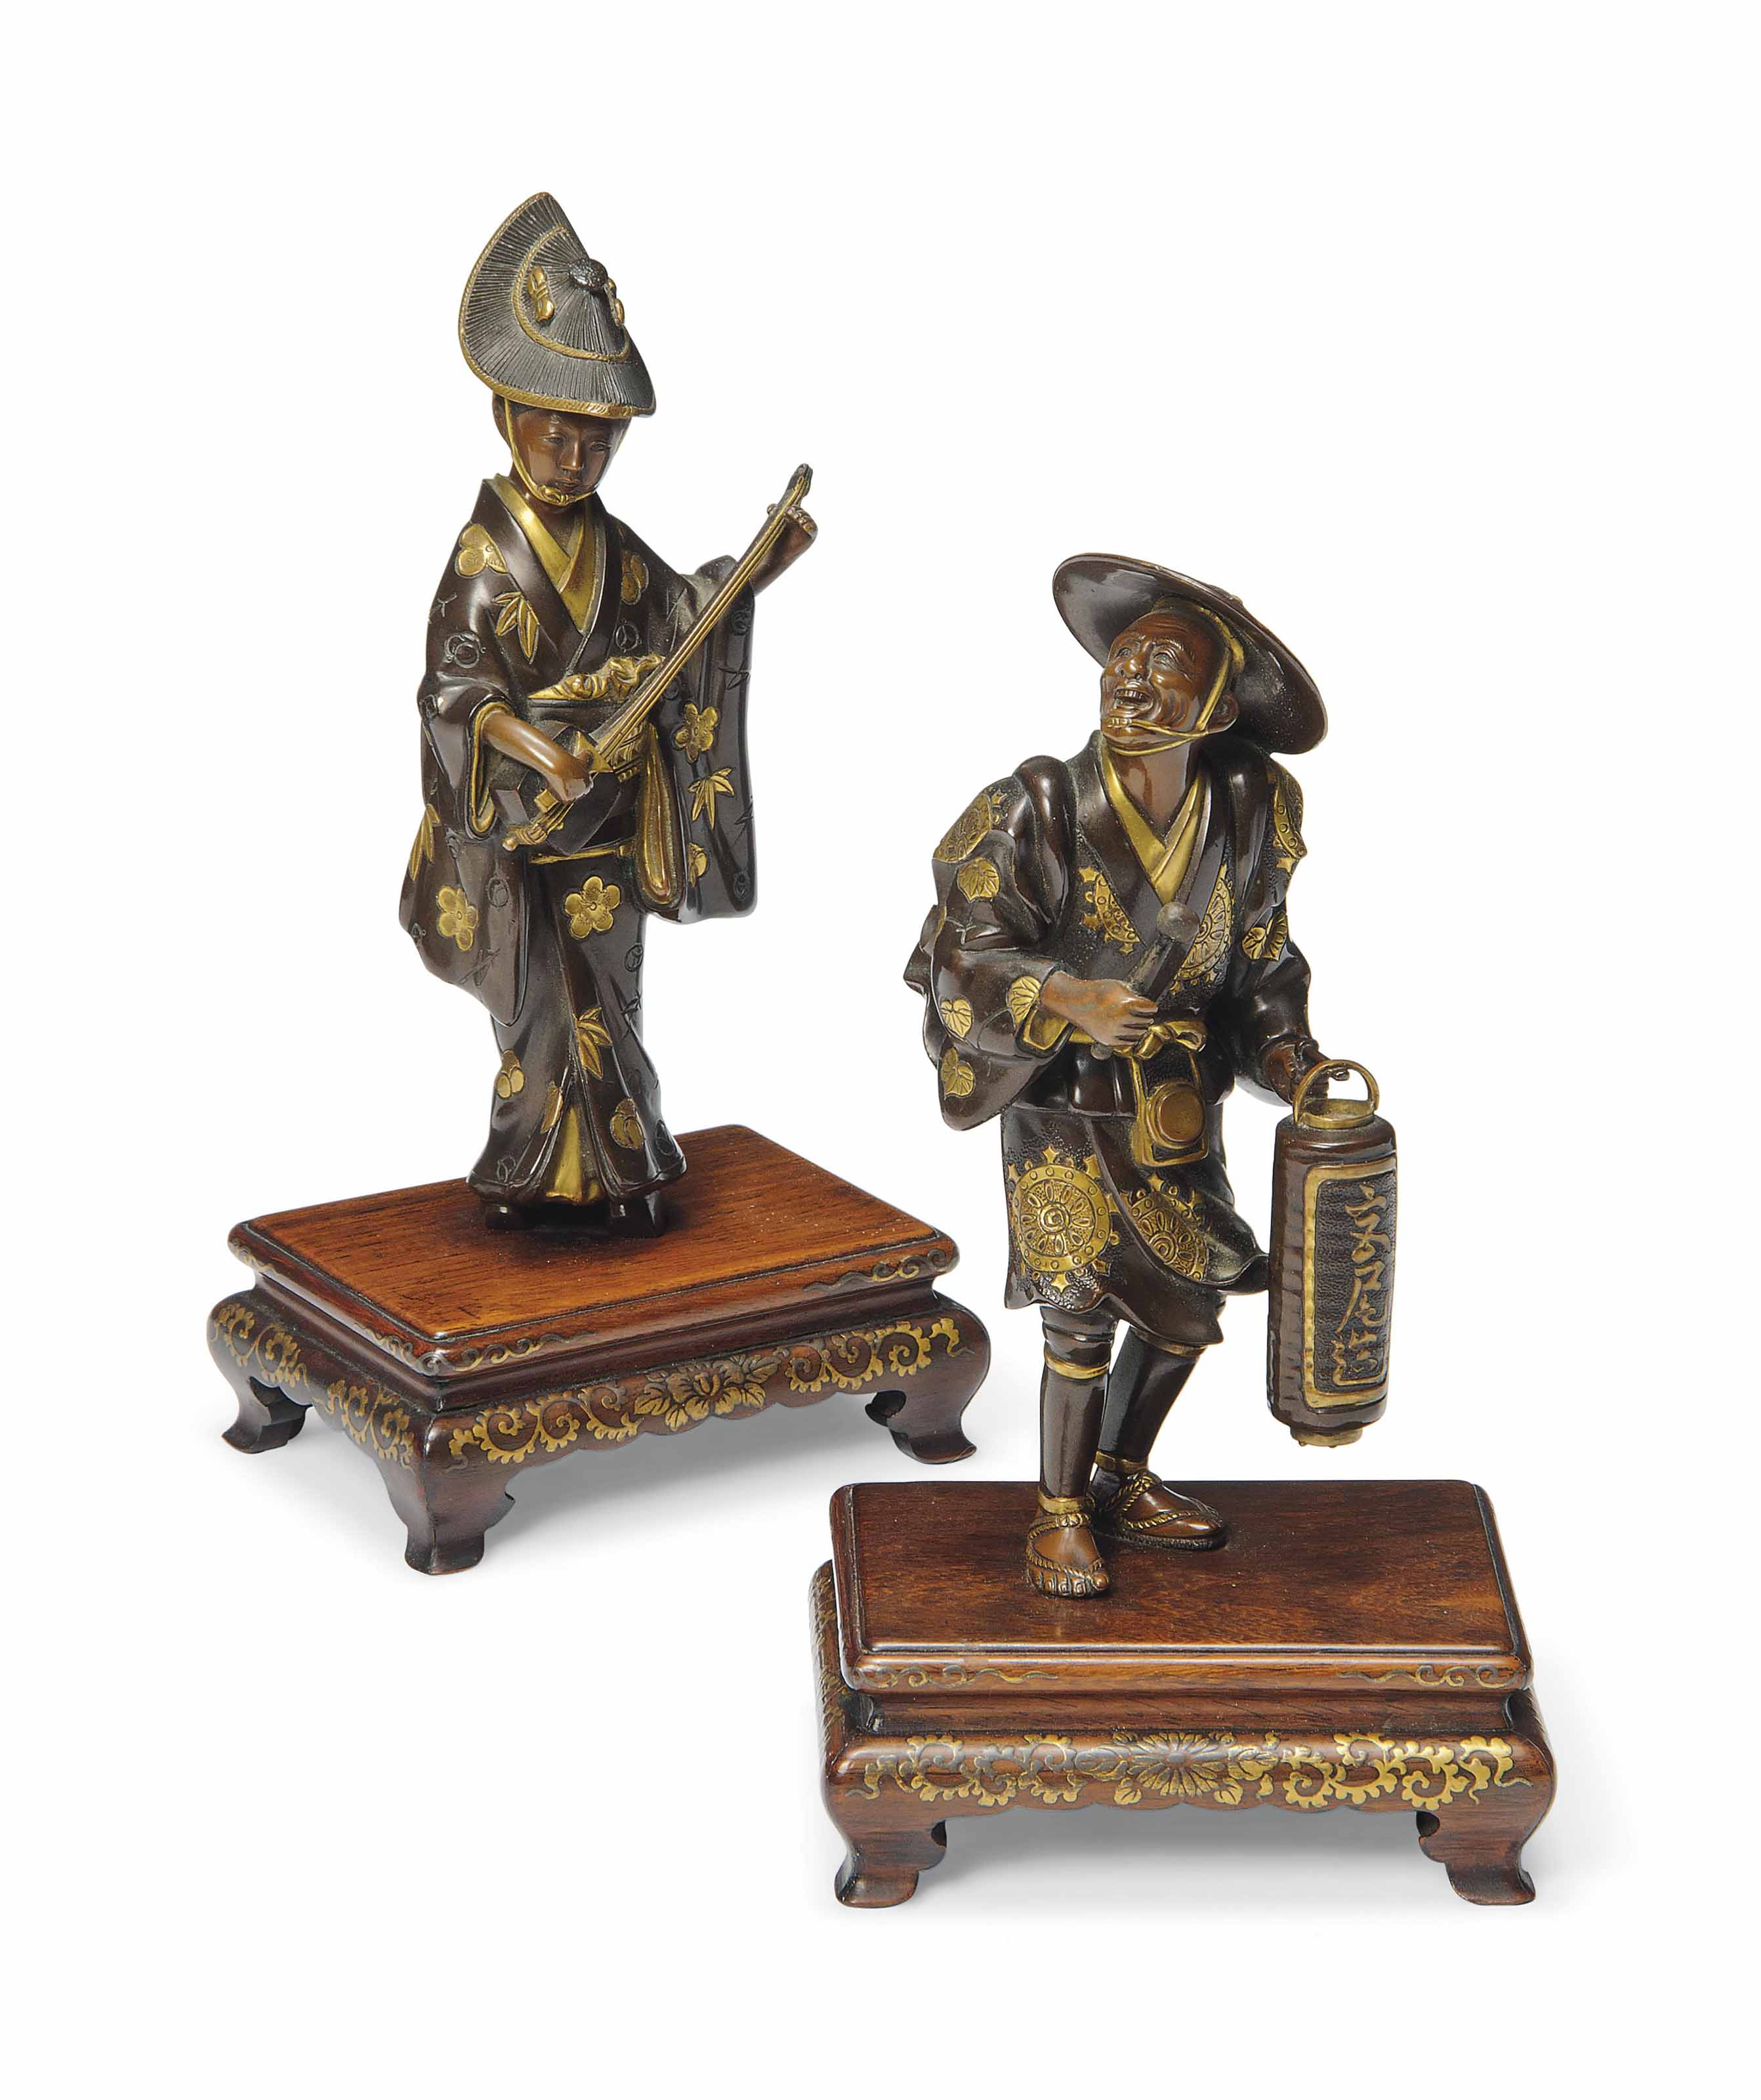 A Pair of Japanese Bronze Okimono [Sculptural Ornament]